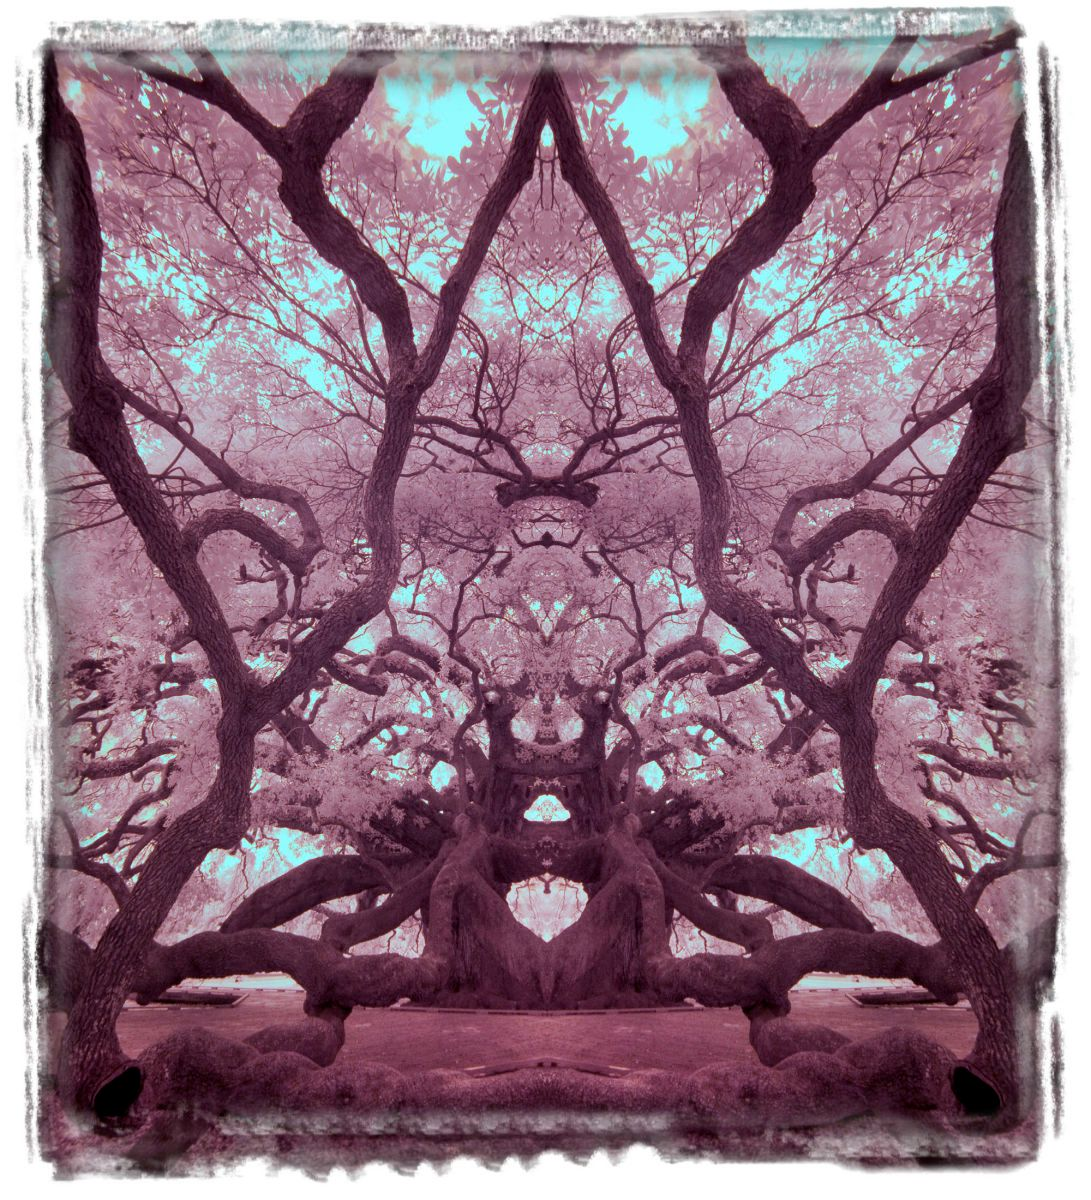 treaty oak, fl'12 3647cc